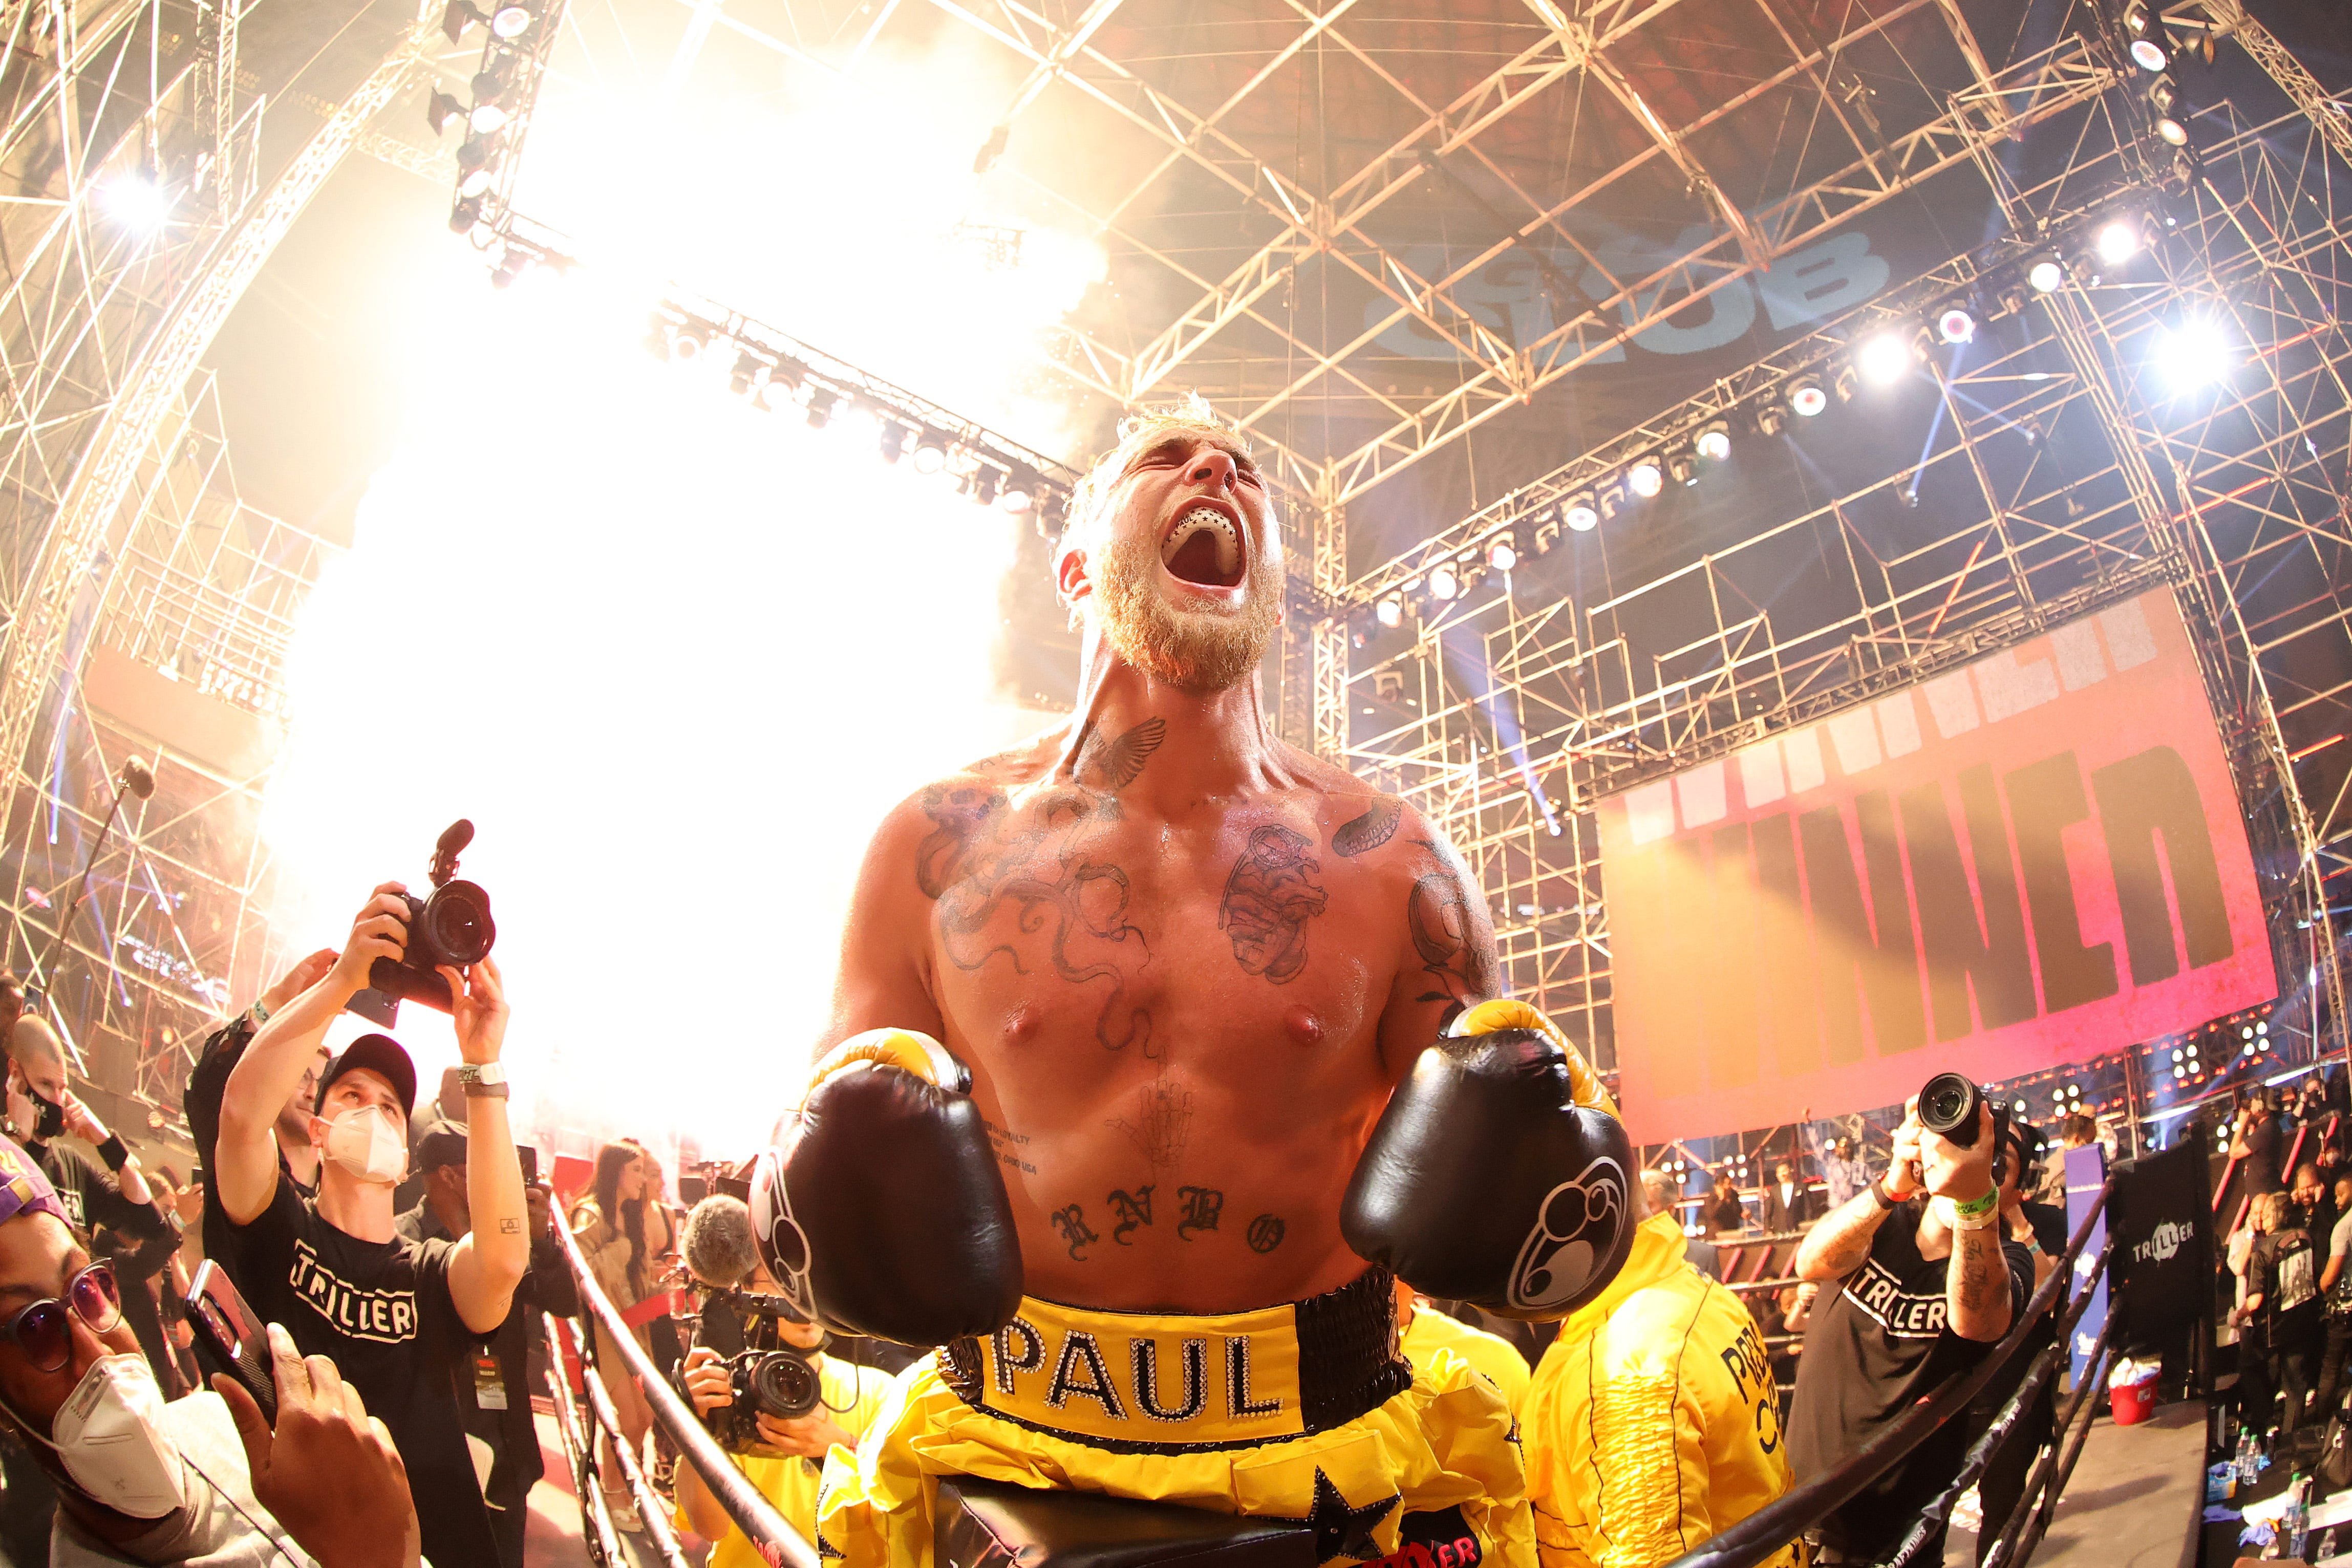 Jake Paul knocks out former MMA fighter Ben Askren in Triller Fight Club boxing match